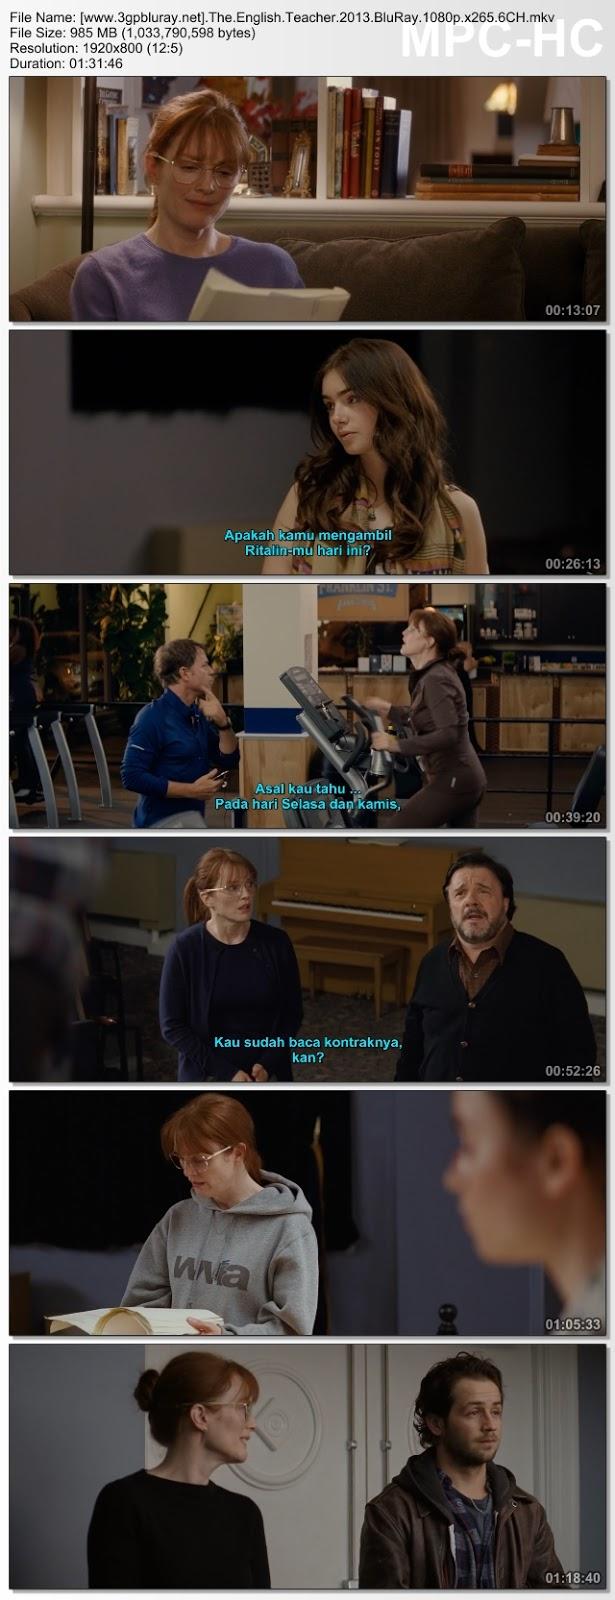 Screenshots Download Film Gratis Hardsub Indo The English Teacher (2013) BluRay 480p MP4 Subtitle Bahasa Indonesia 3GP